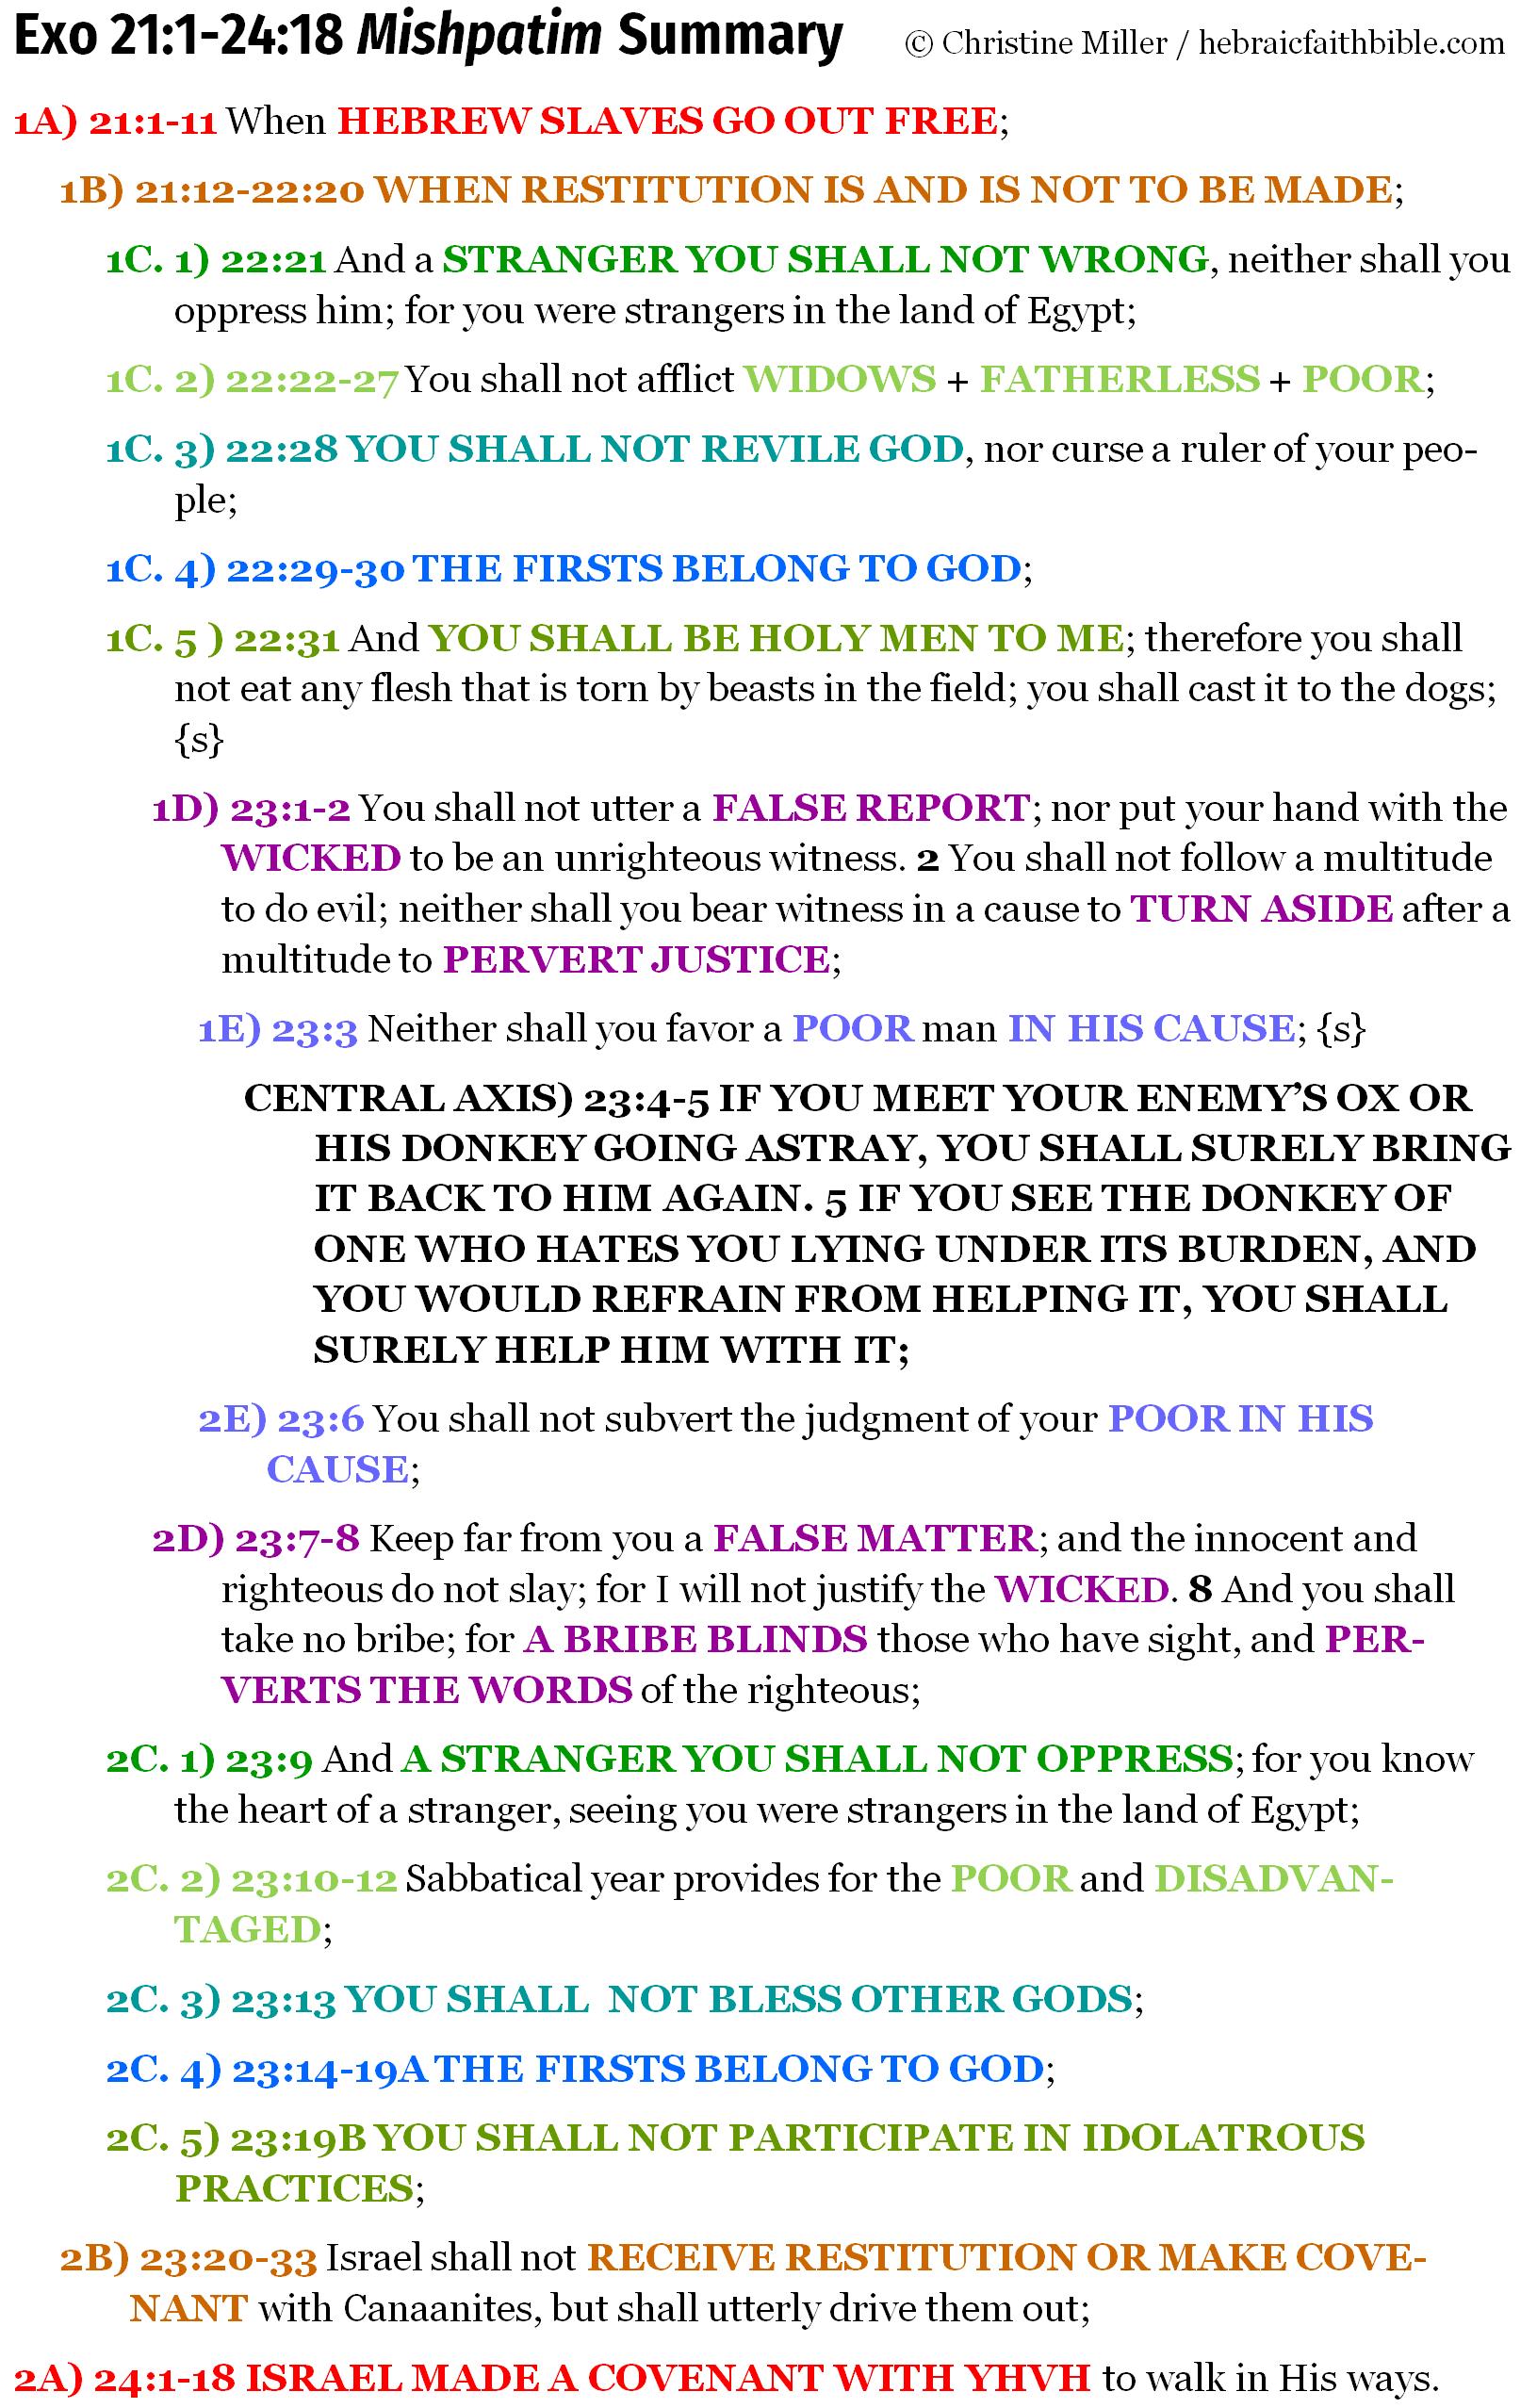 Exo 21:1-24:18 Mishpatim chiasm summary | hebraicfaithbible.com